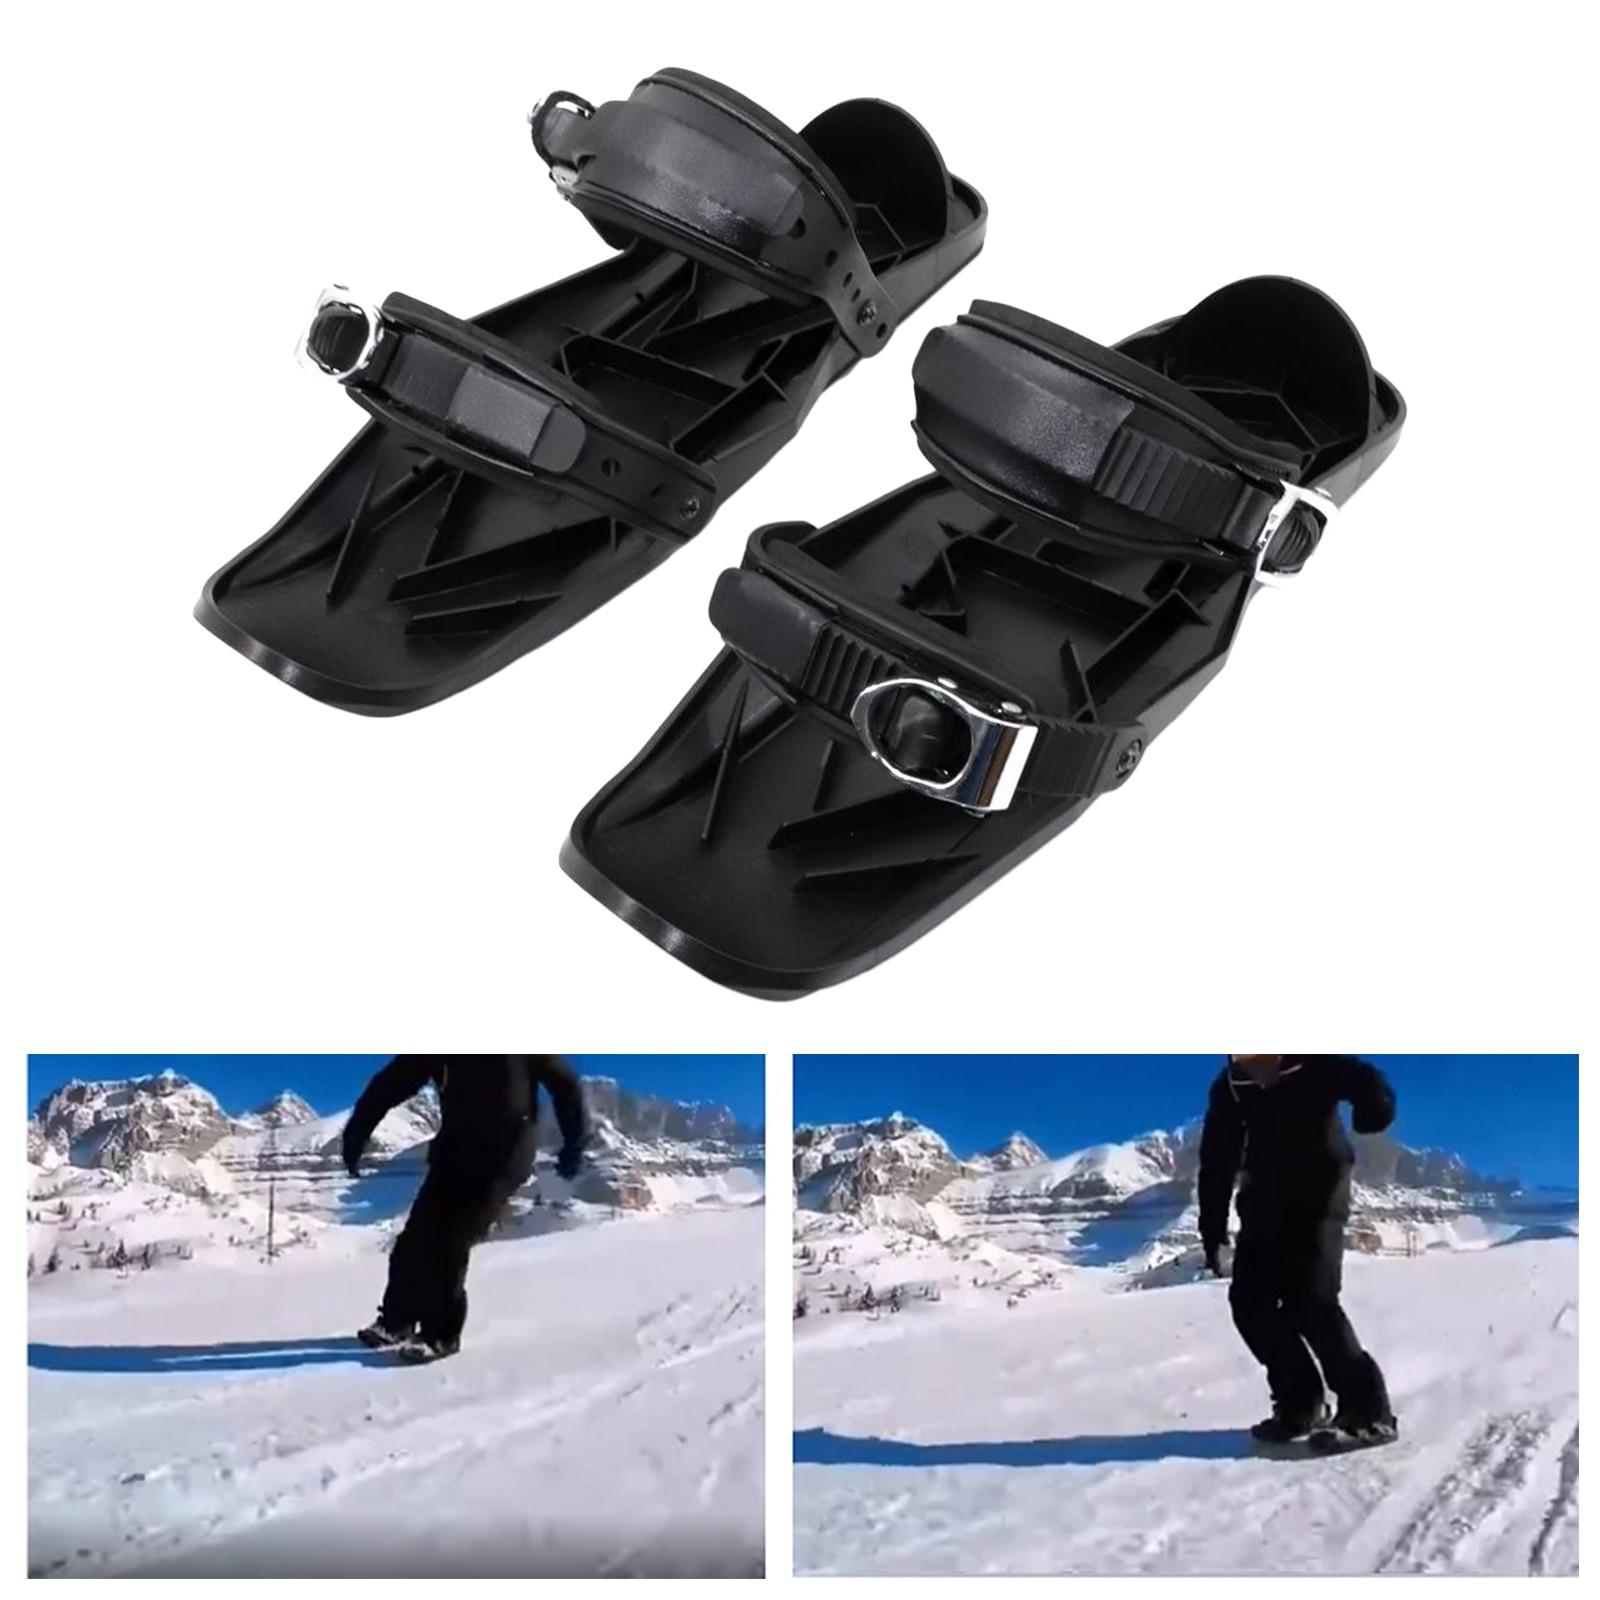 Creative Ski Skates Nylon Sole PU Bindings- Mini Snowskates Snowboard Sled- One Size Fits All, Stainless Steel Board Insert Sole